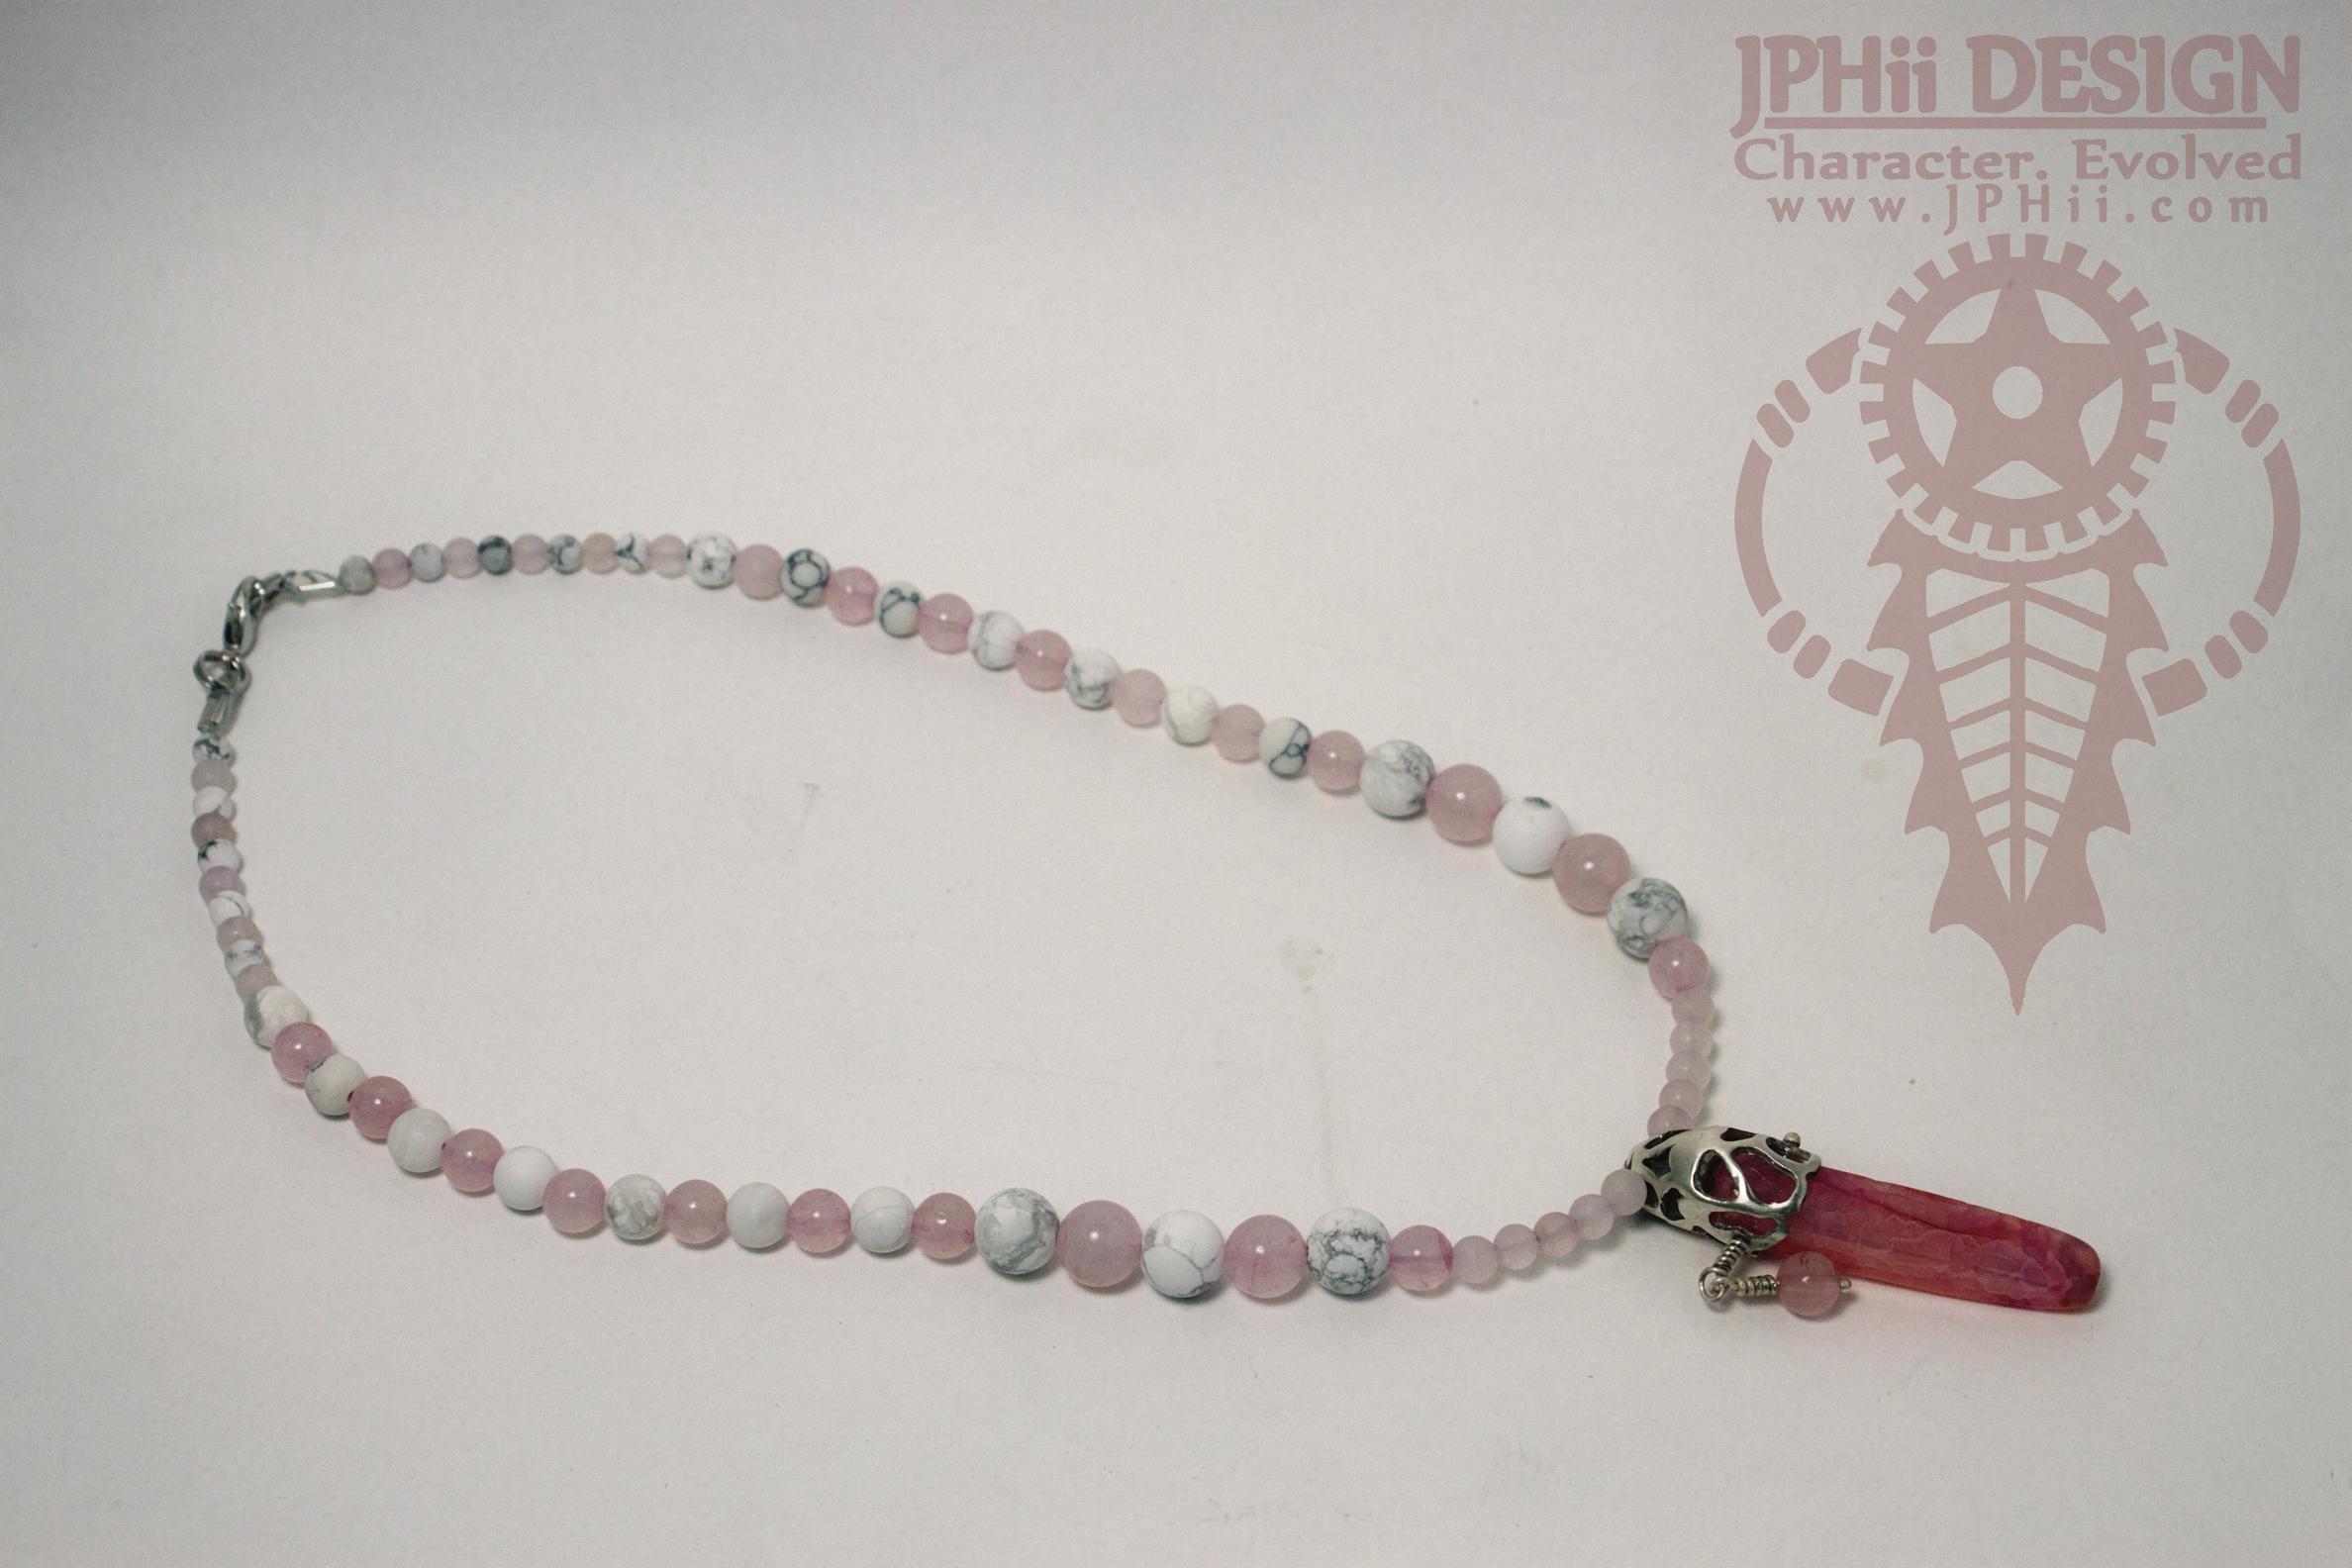 Pink Serpula Necklace